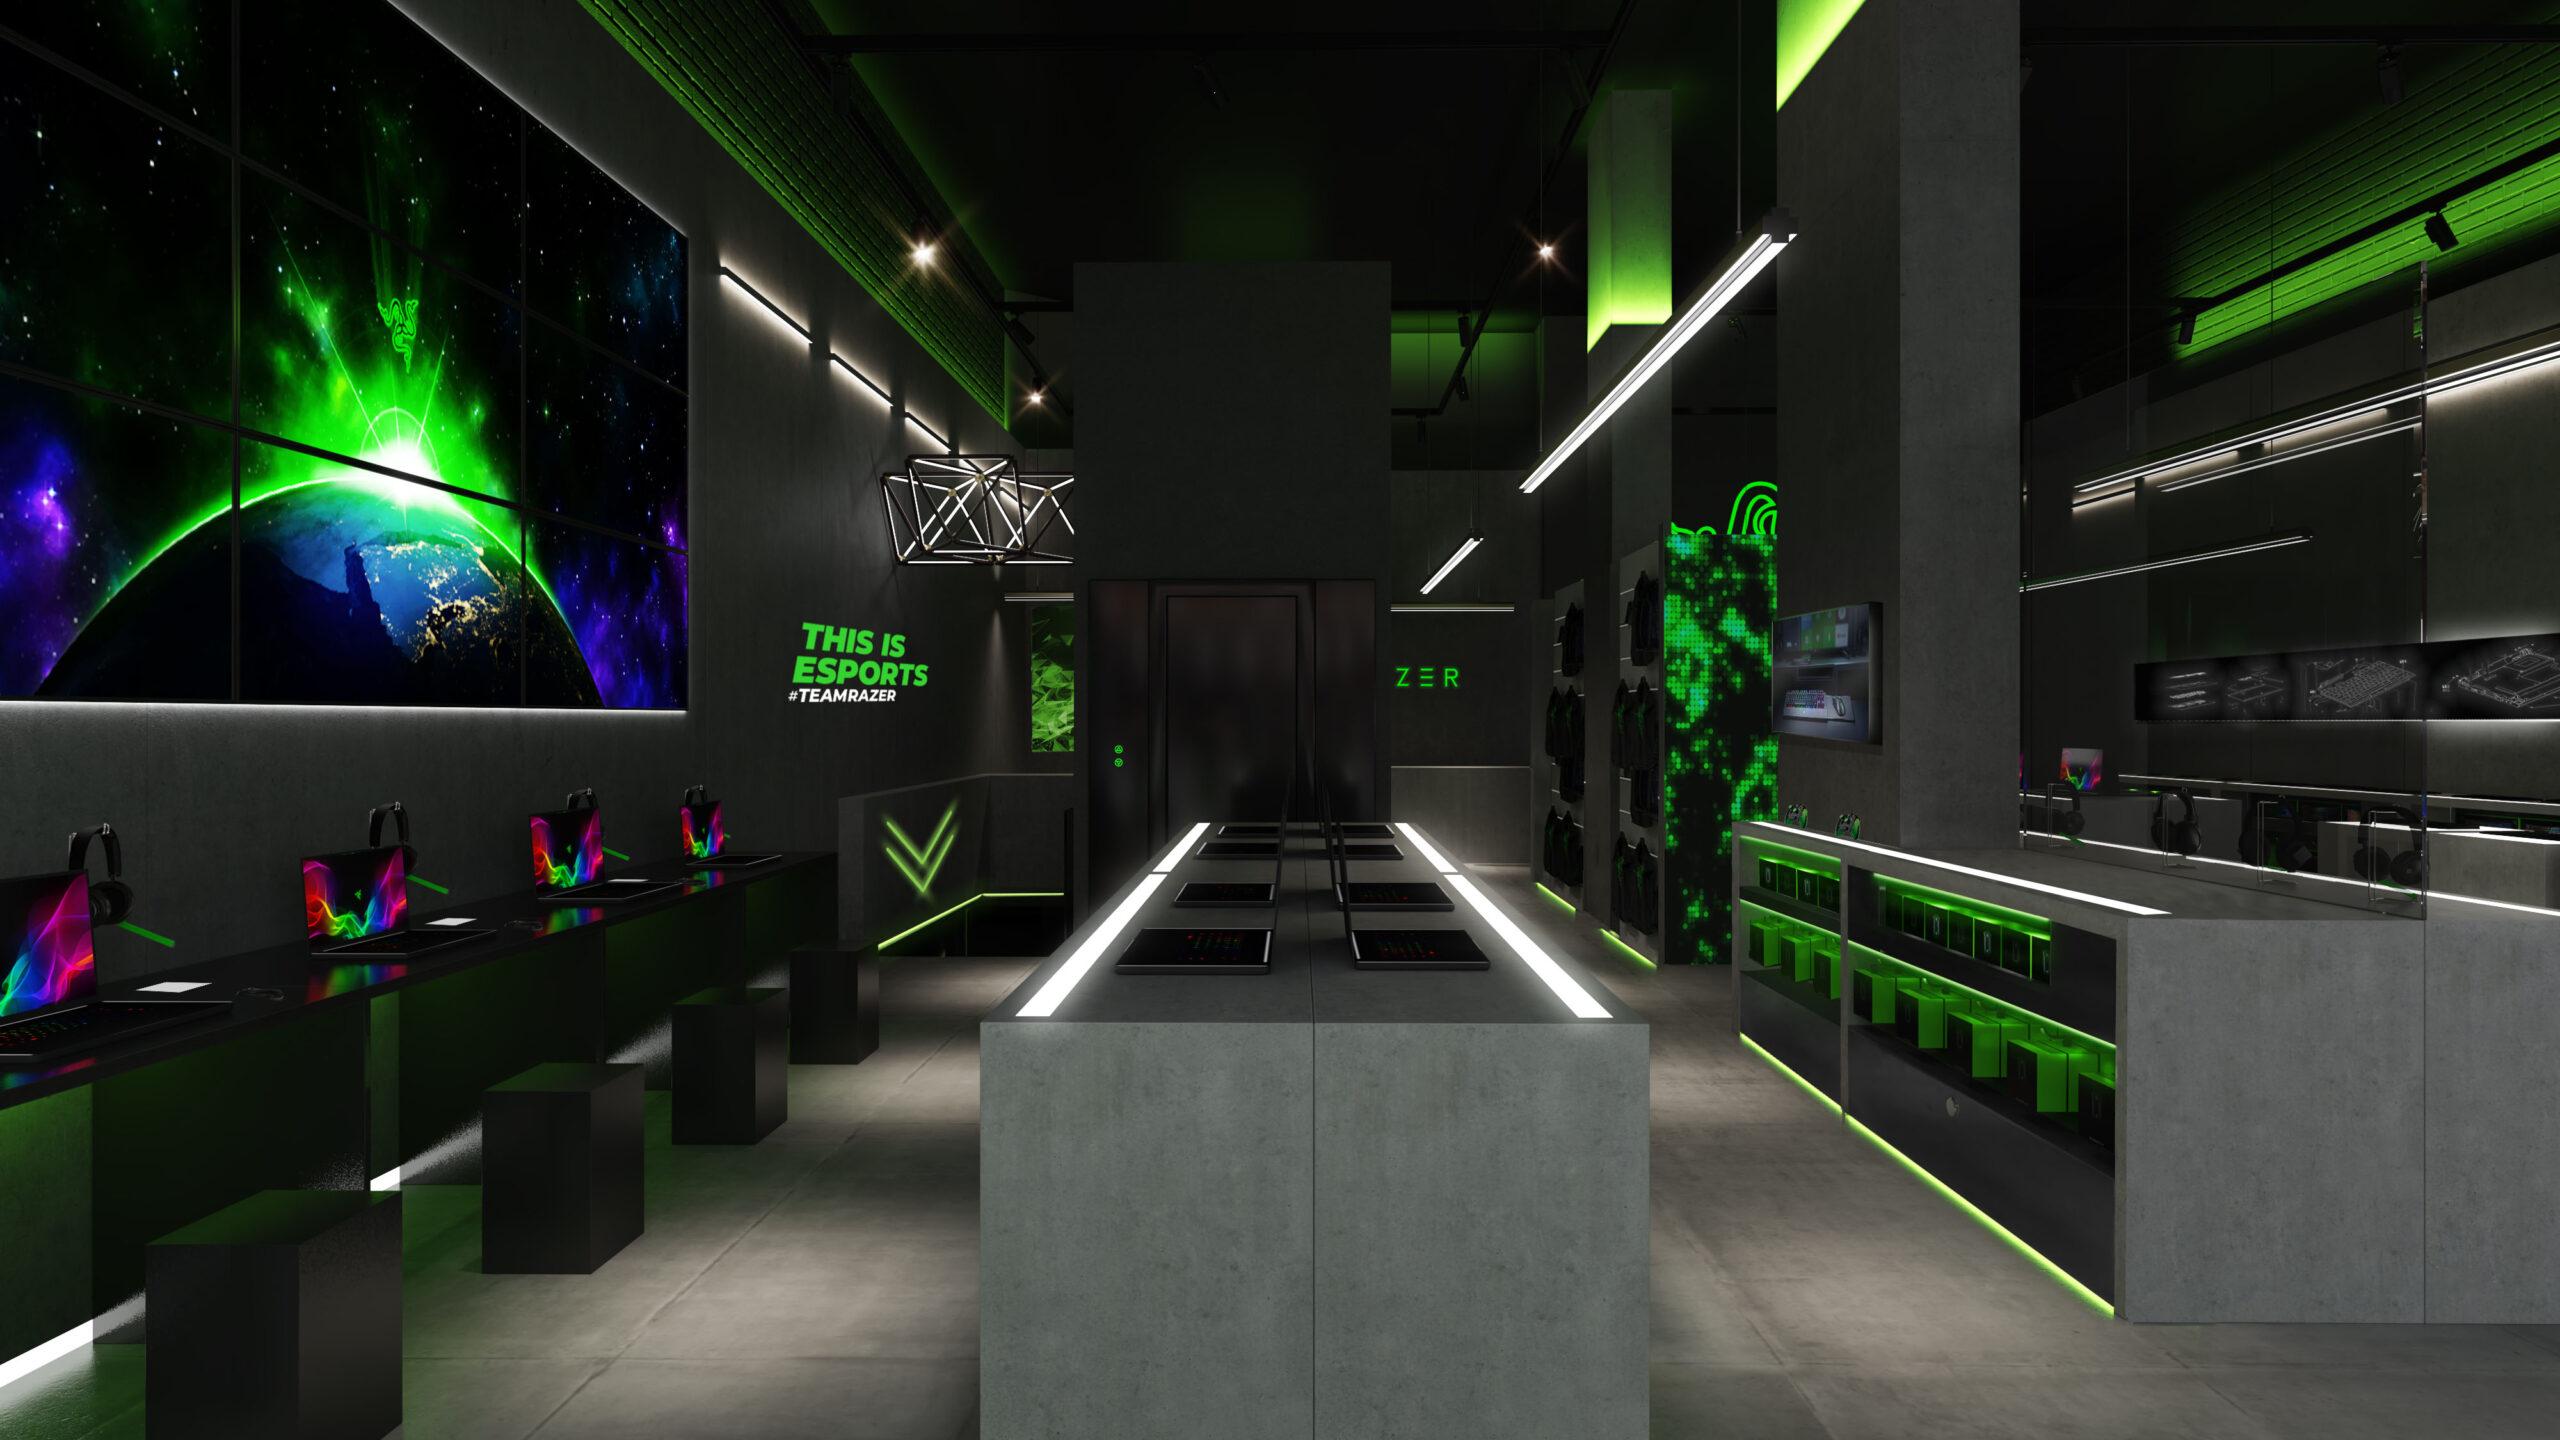 Razer gaming space by Your Studio, photo: Marcus Peel